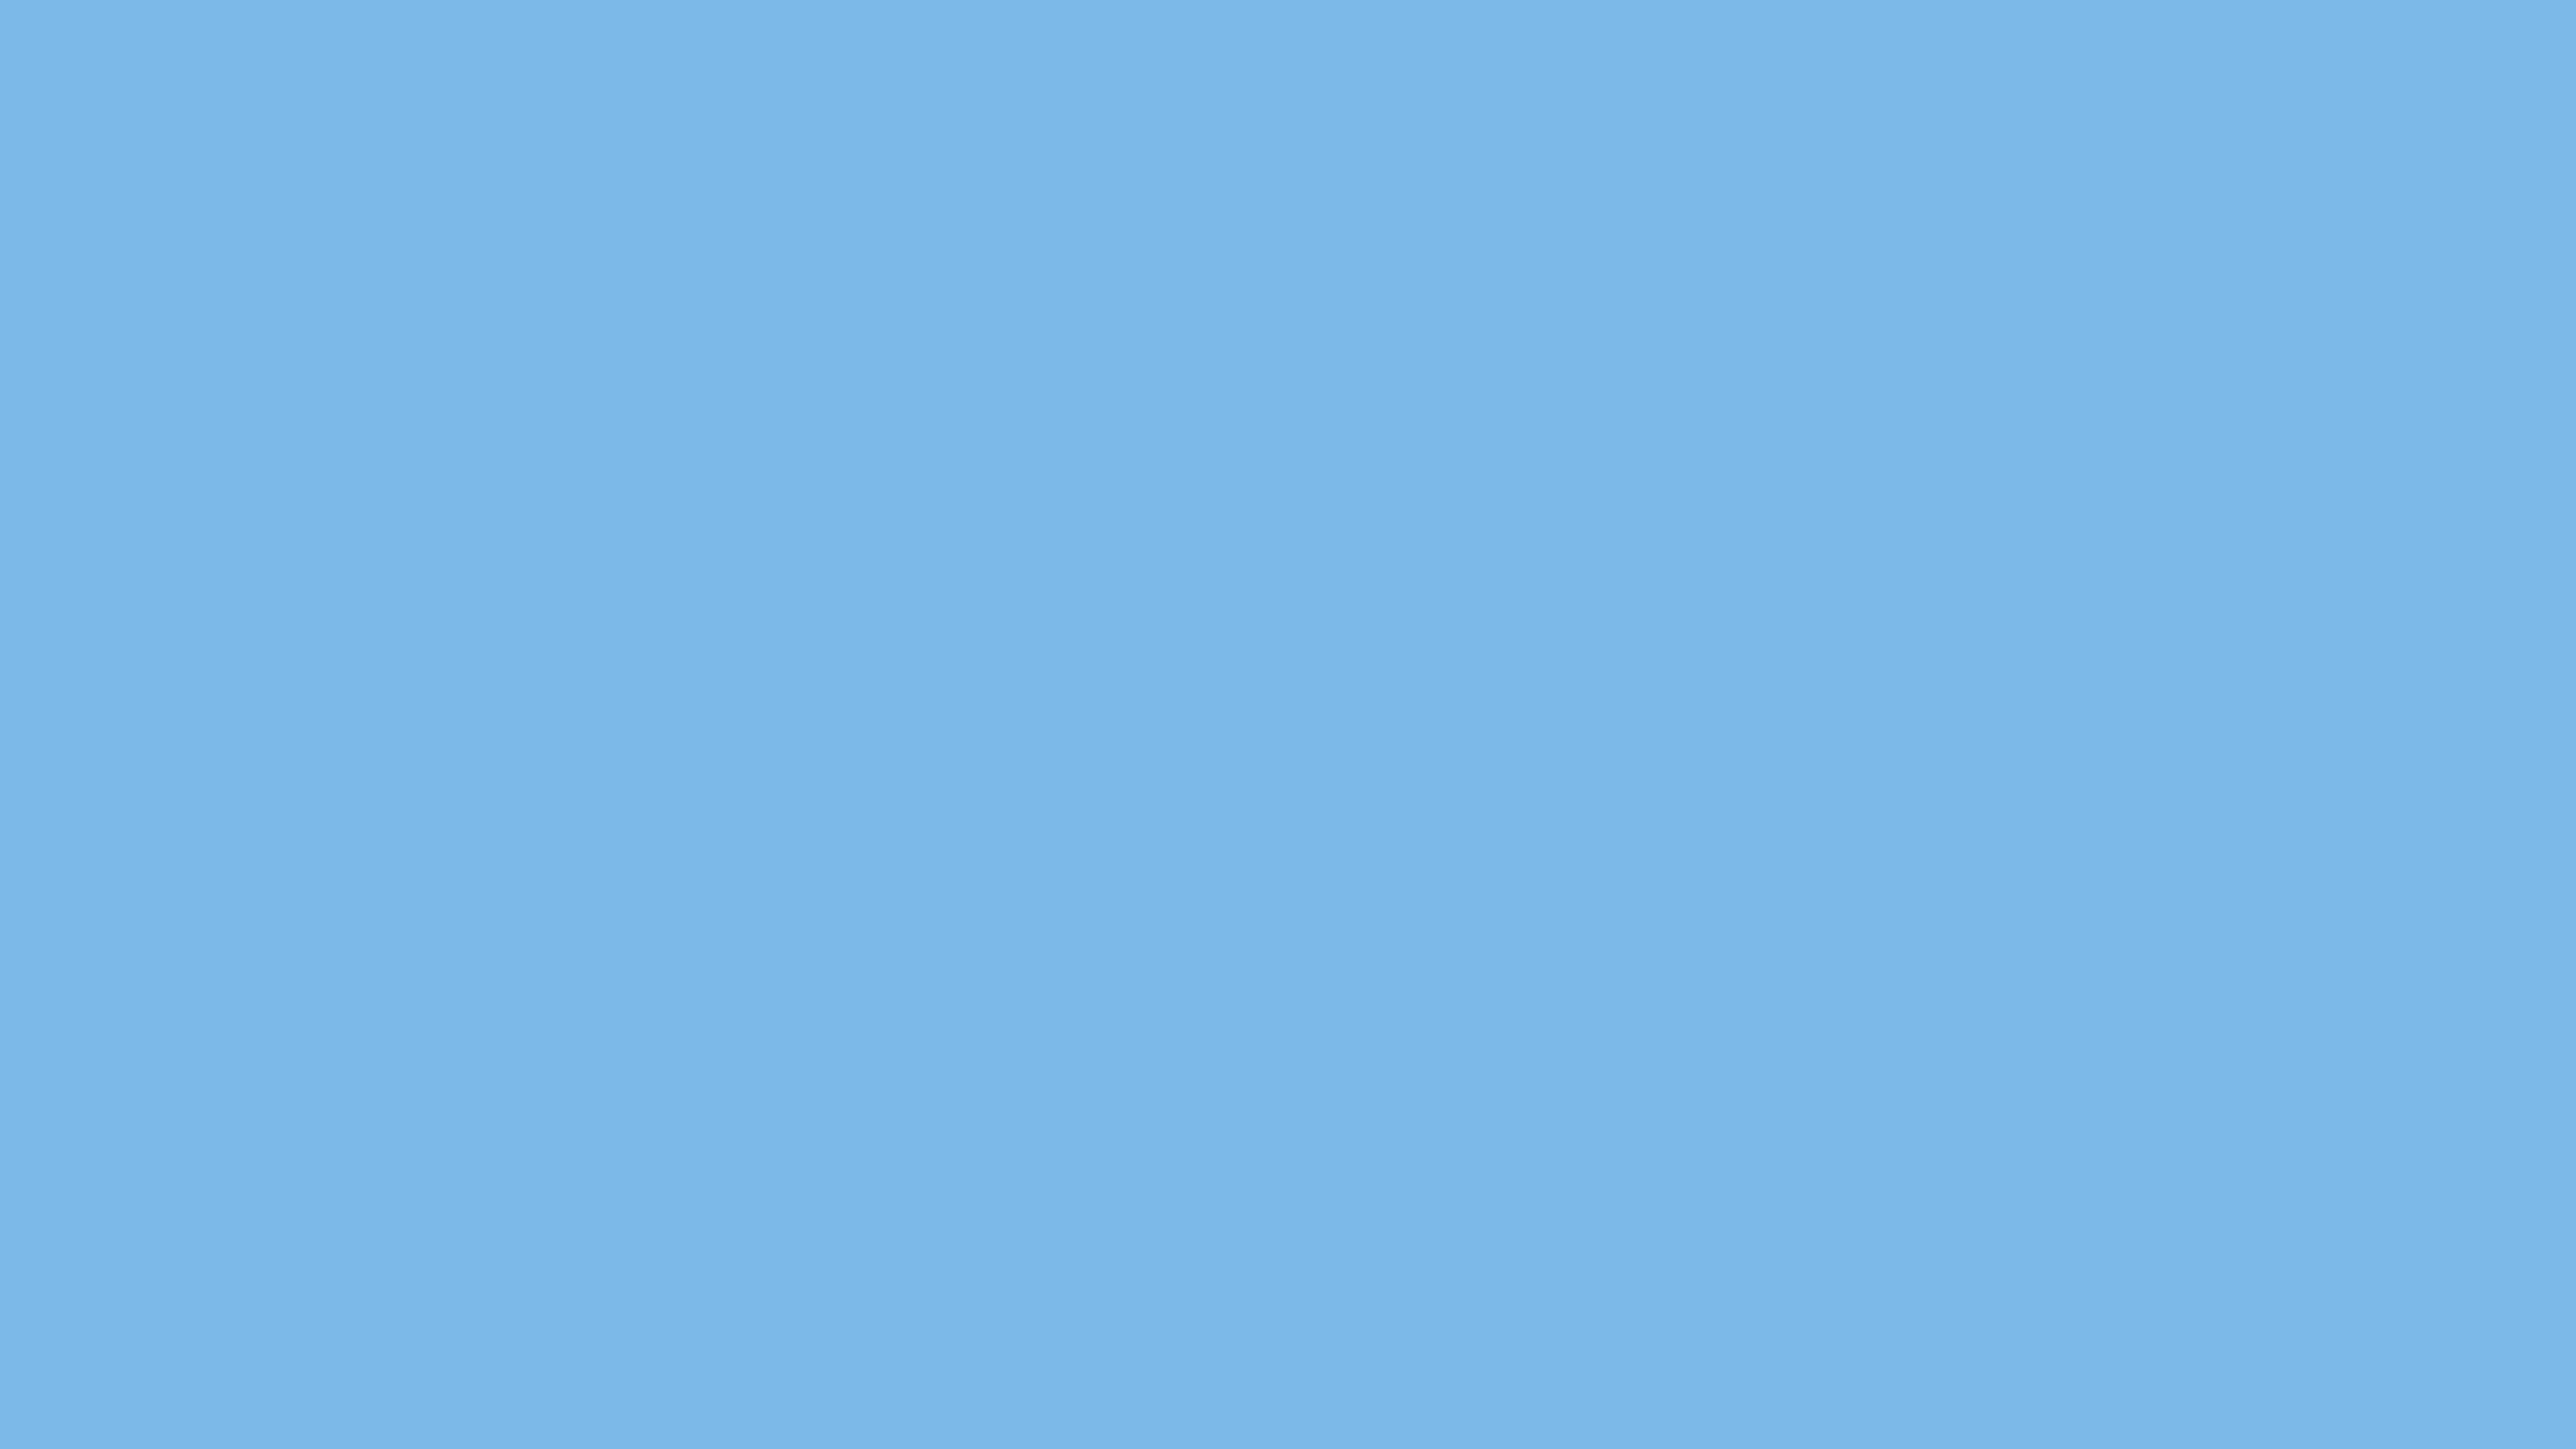 7680x4320 Aero Solid Color Background